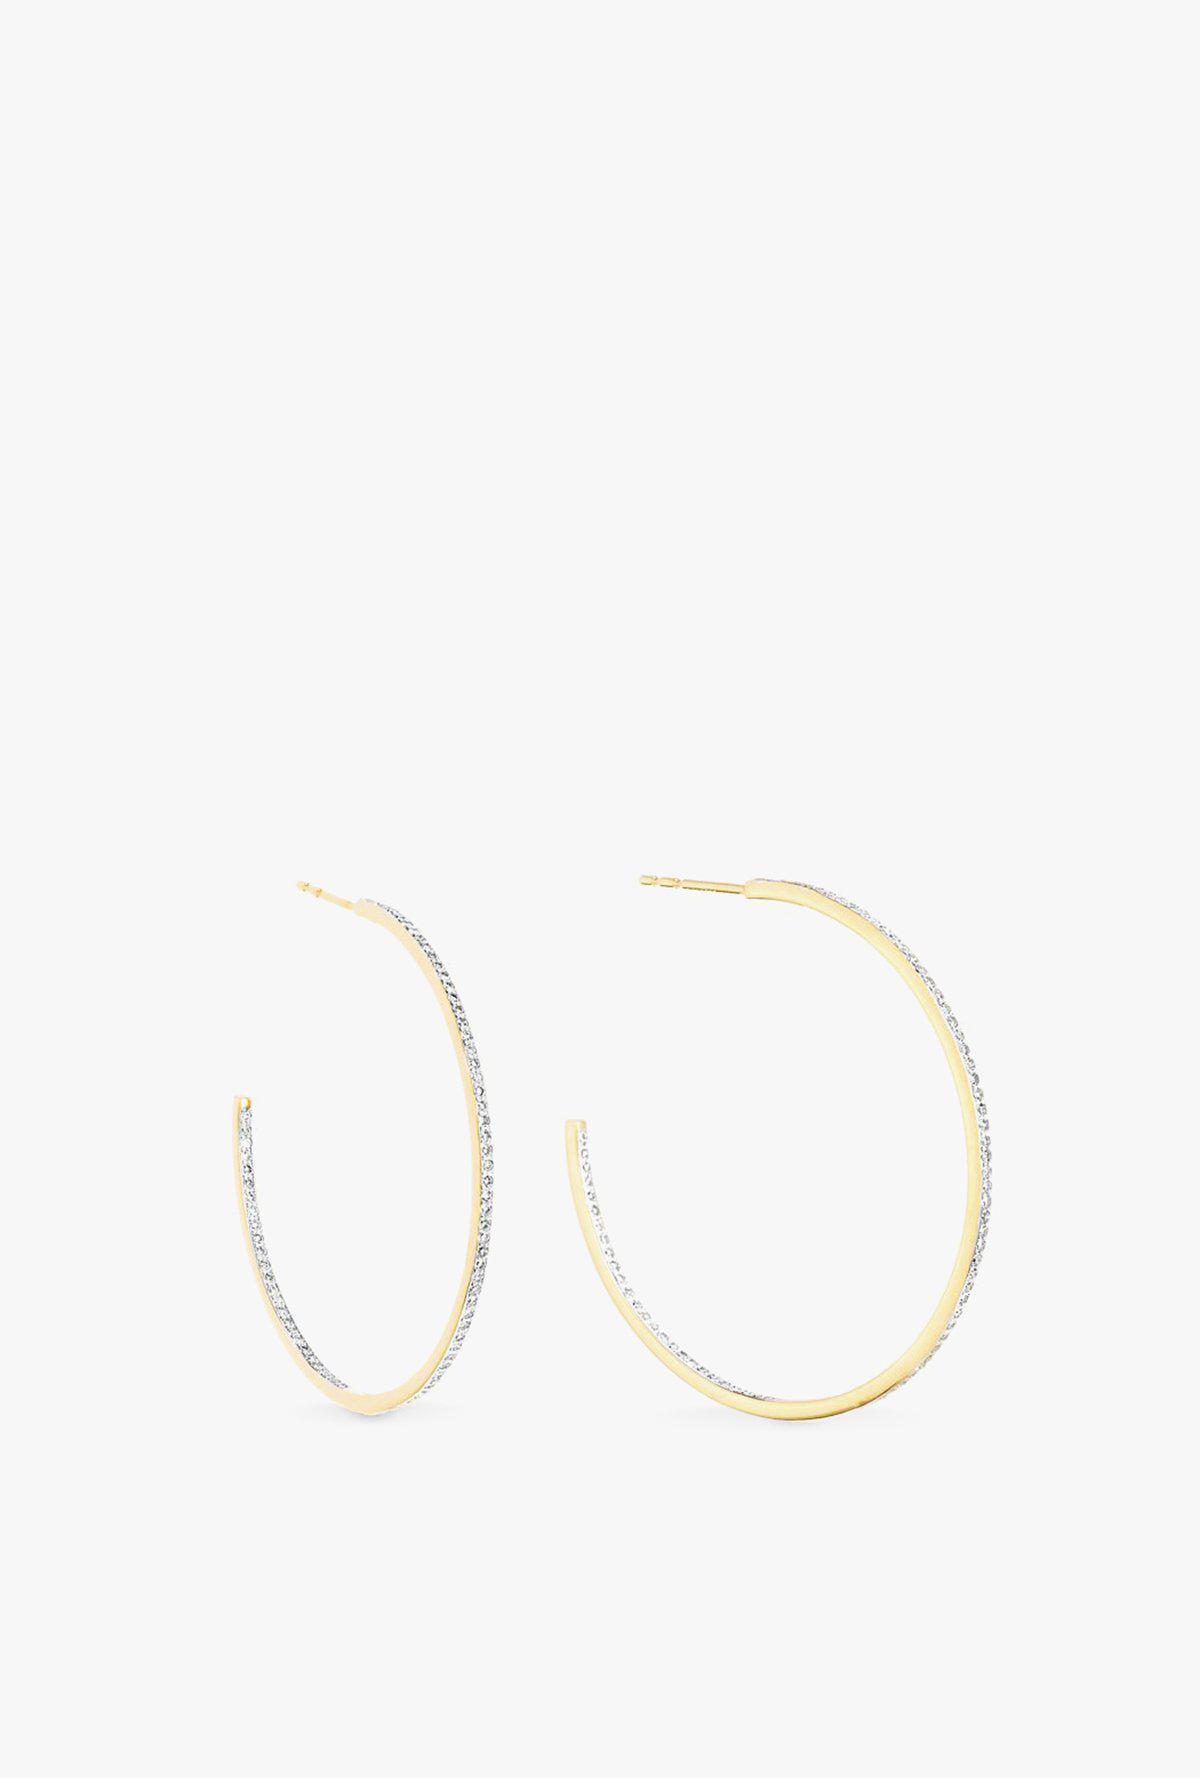 e76154132 Lyst - Adina Reyter Large Pavé Hoop Earrings in Metallic